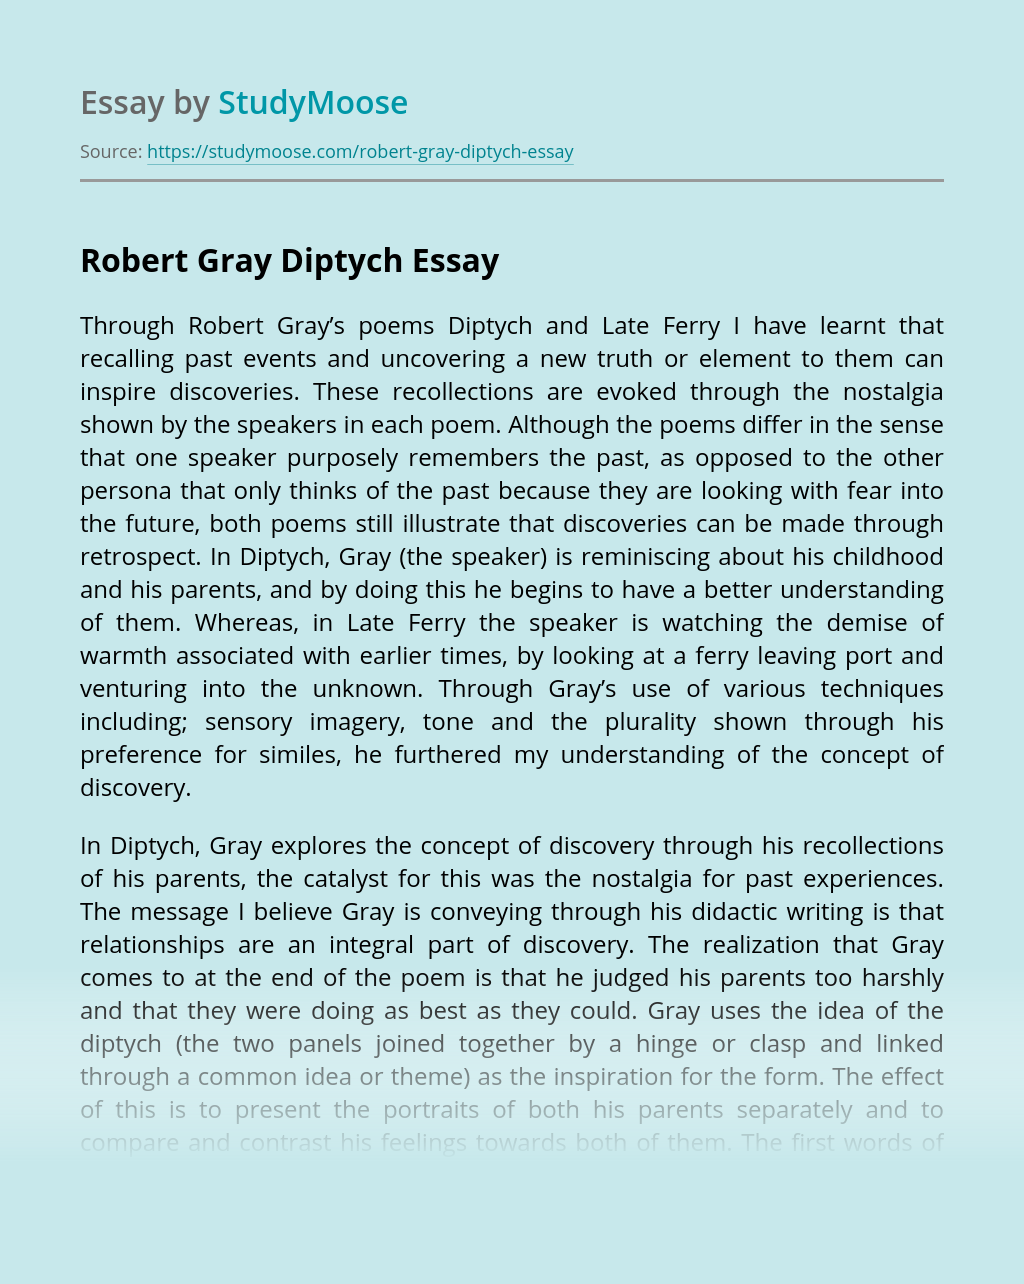 Robert Gray Diptych